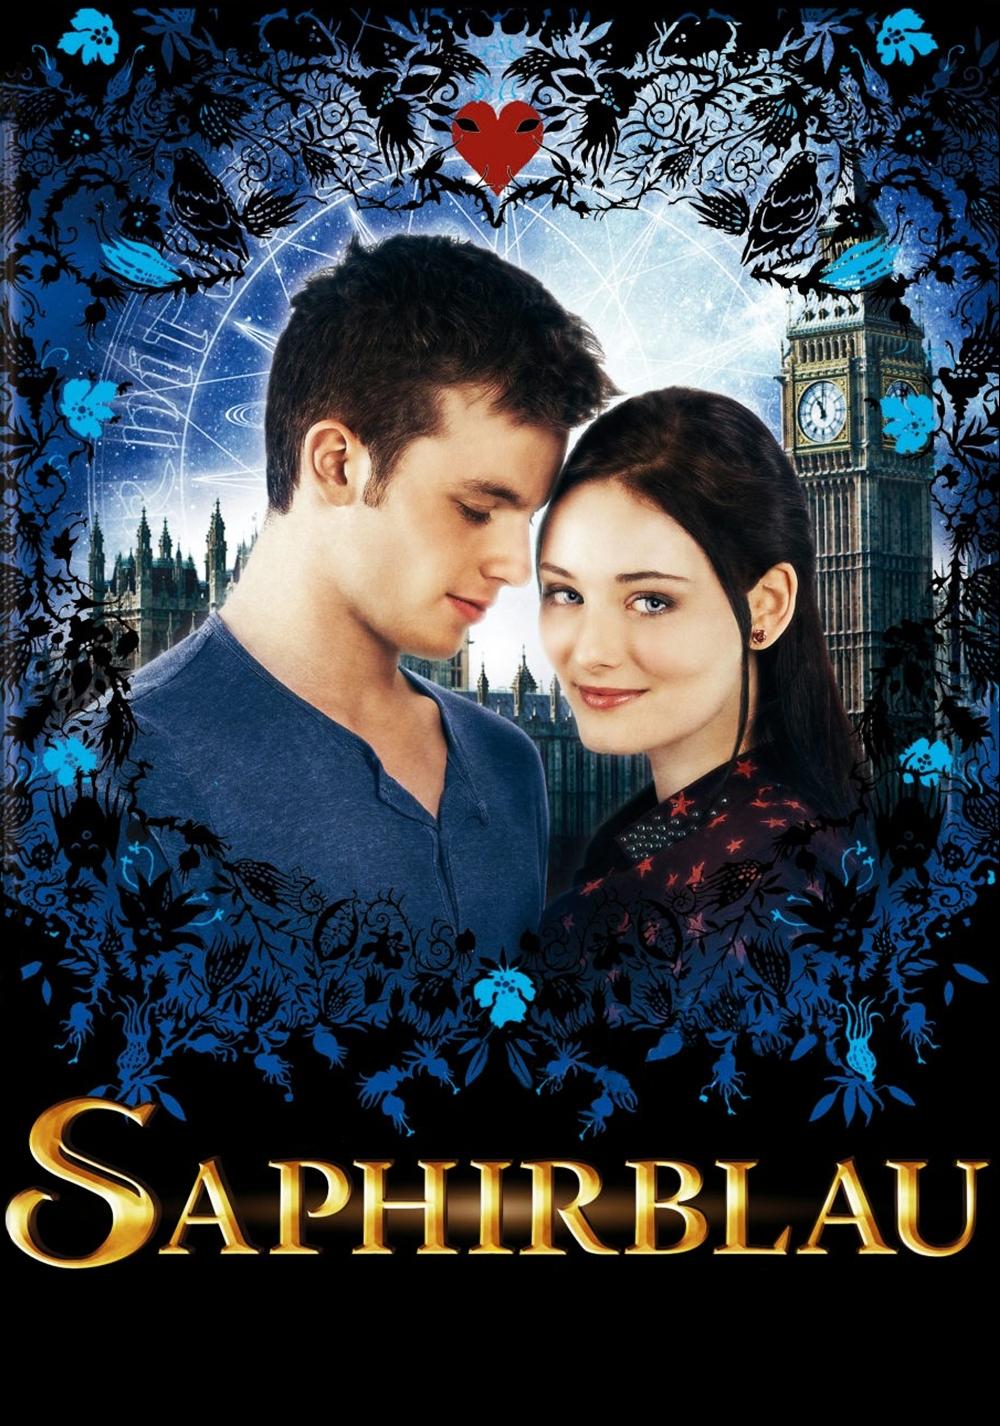 Saphirblau Download